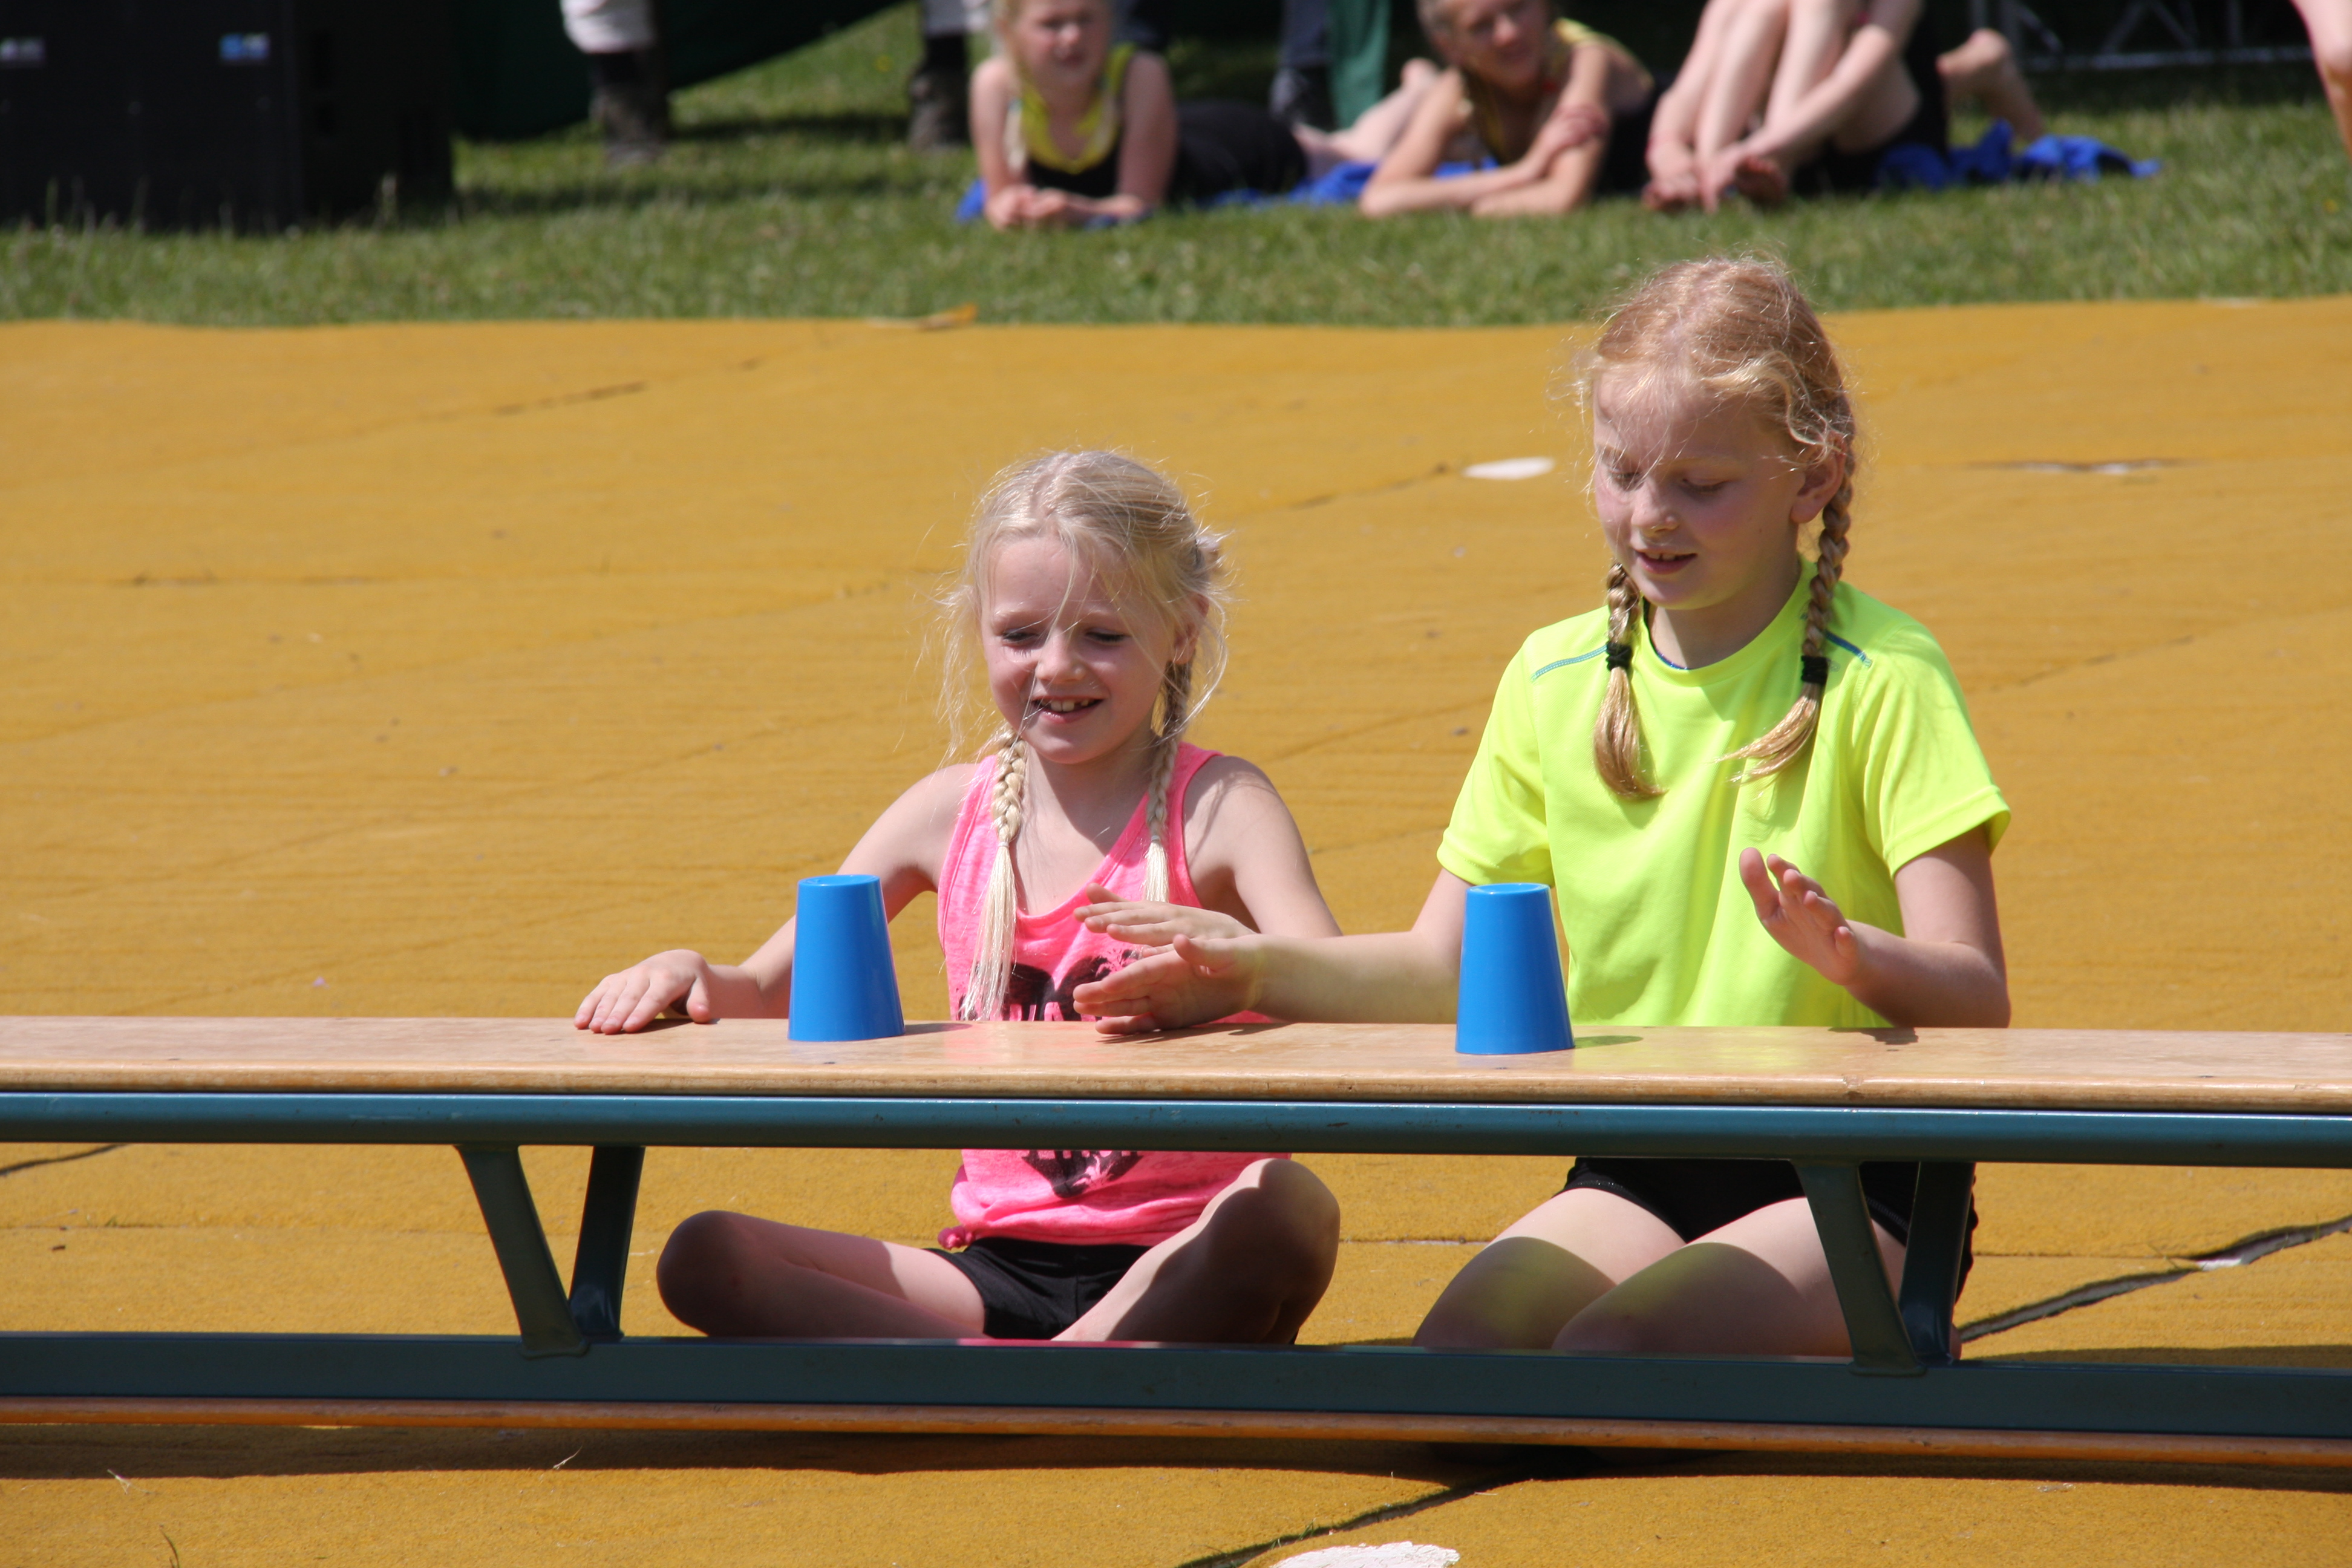 gymnastiekuitvoering-juni-2015-012